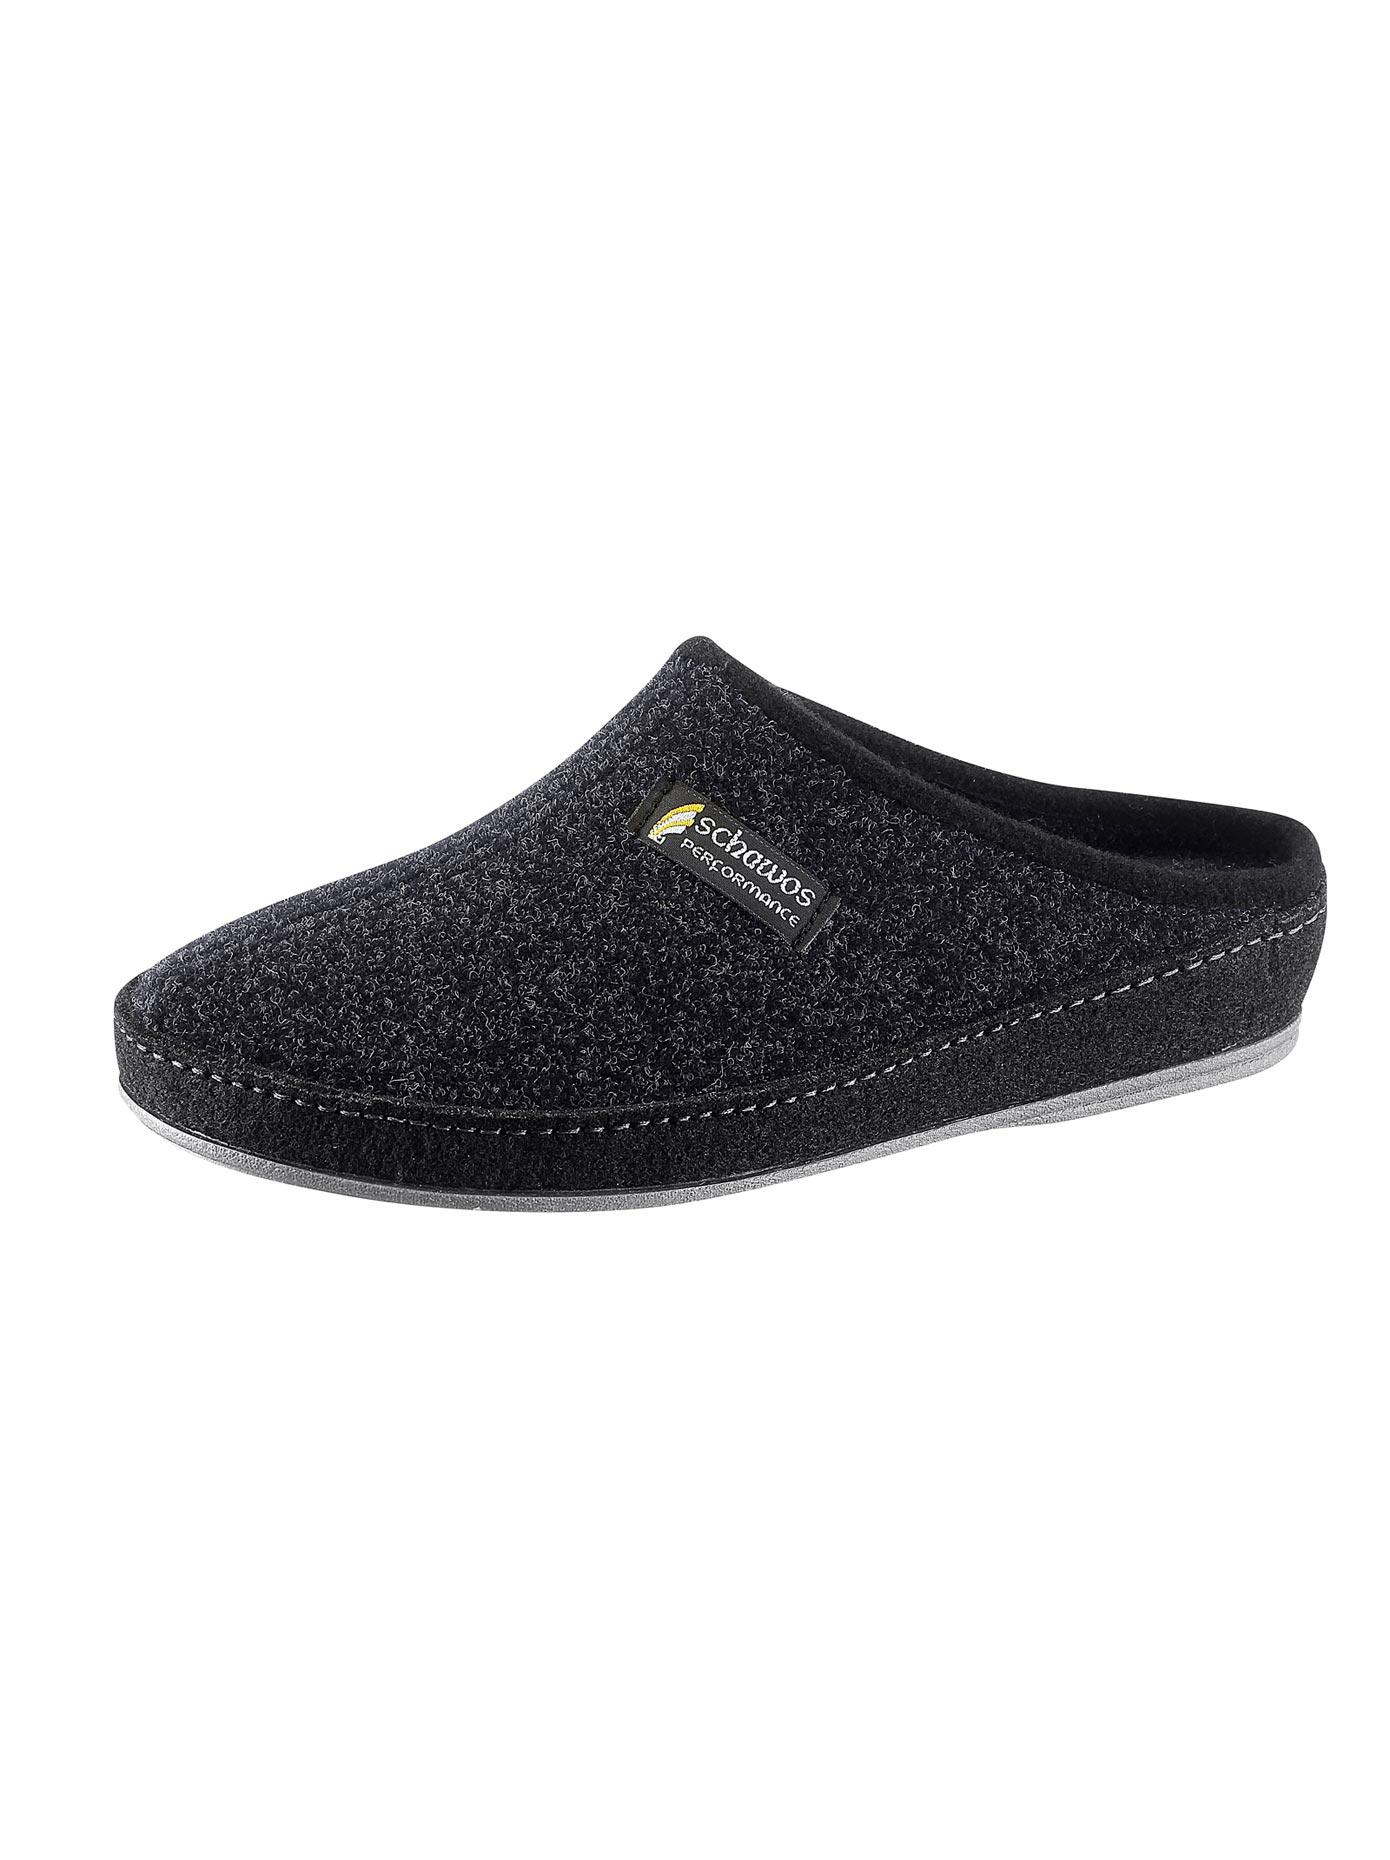 Schawos Pantoffel mit rutschhemmender Synthetik-Laufsohle | Schuhe > Hausschuhe > Pantoffeln | Schwarz | Classic